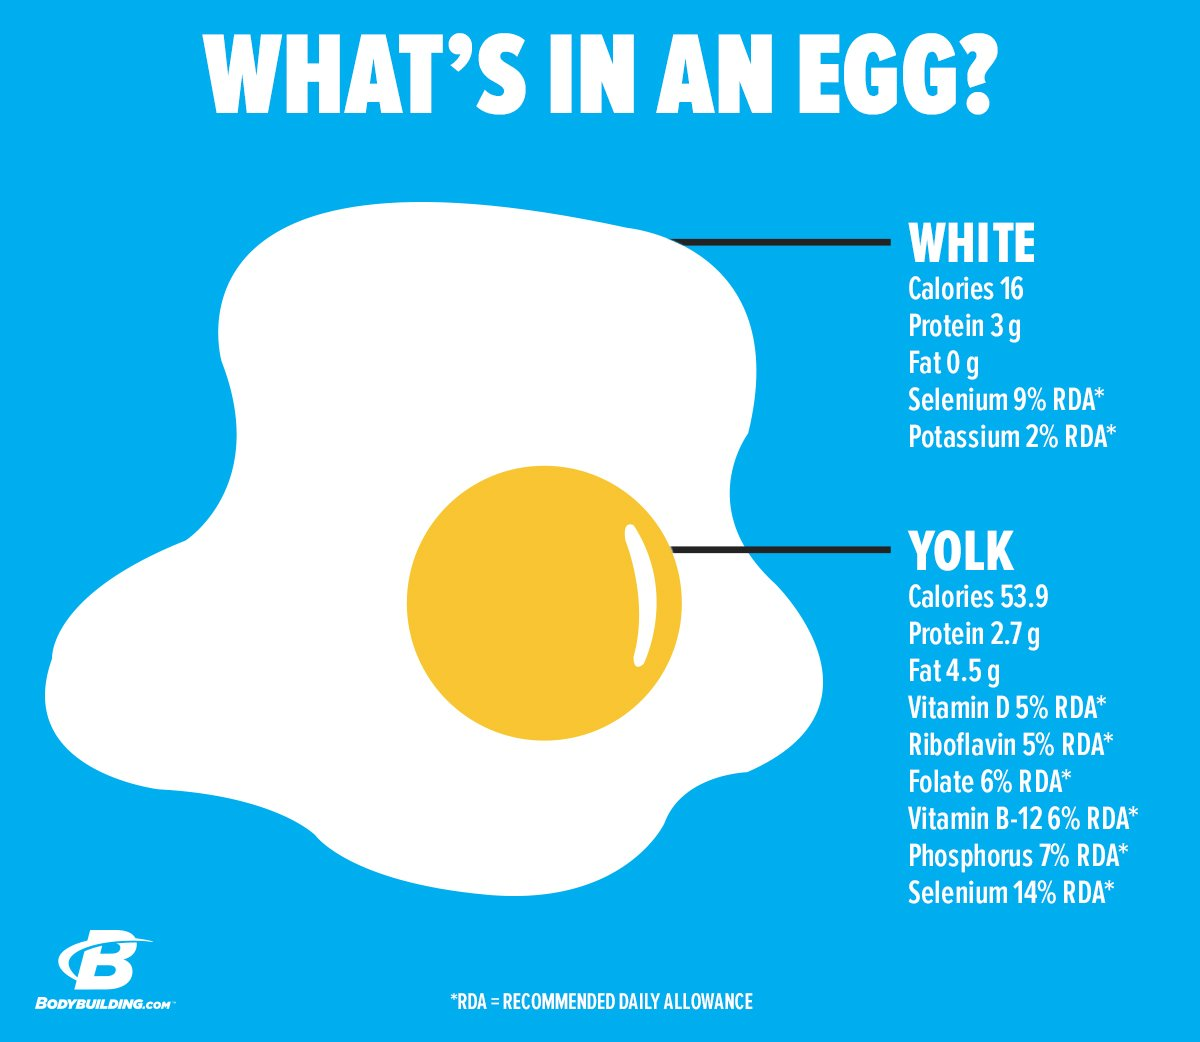 Egg Yolk Fat 41